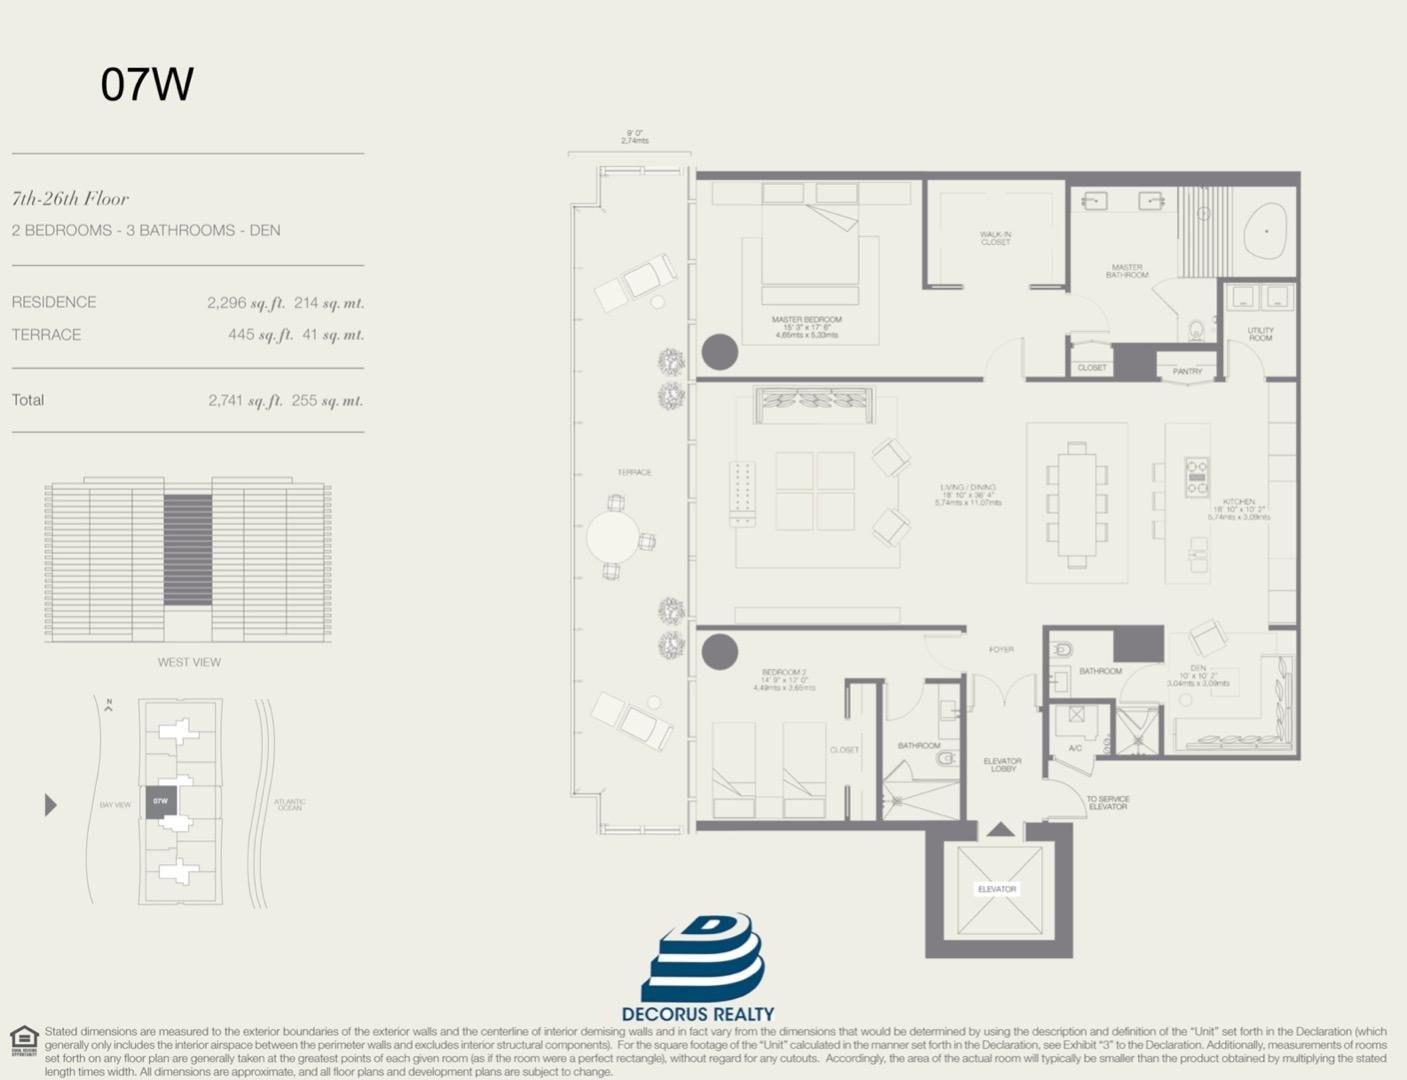 Floor plan image 07W - 2/3  - 2296 sqft image